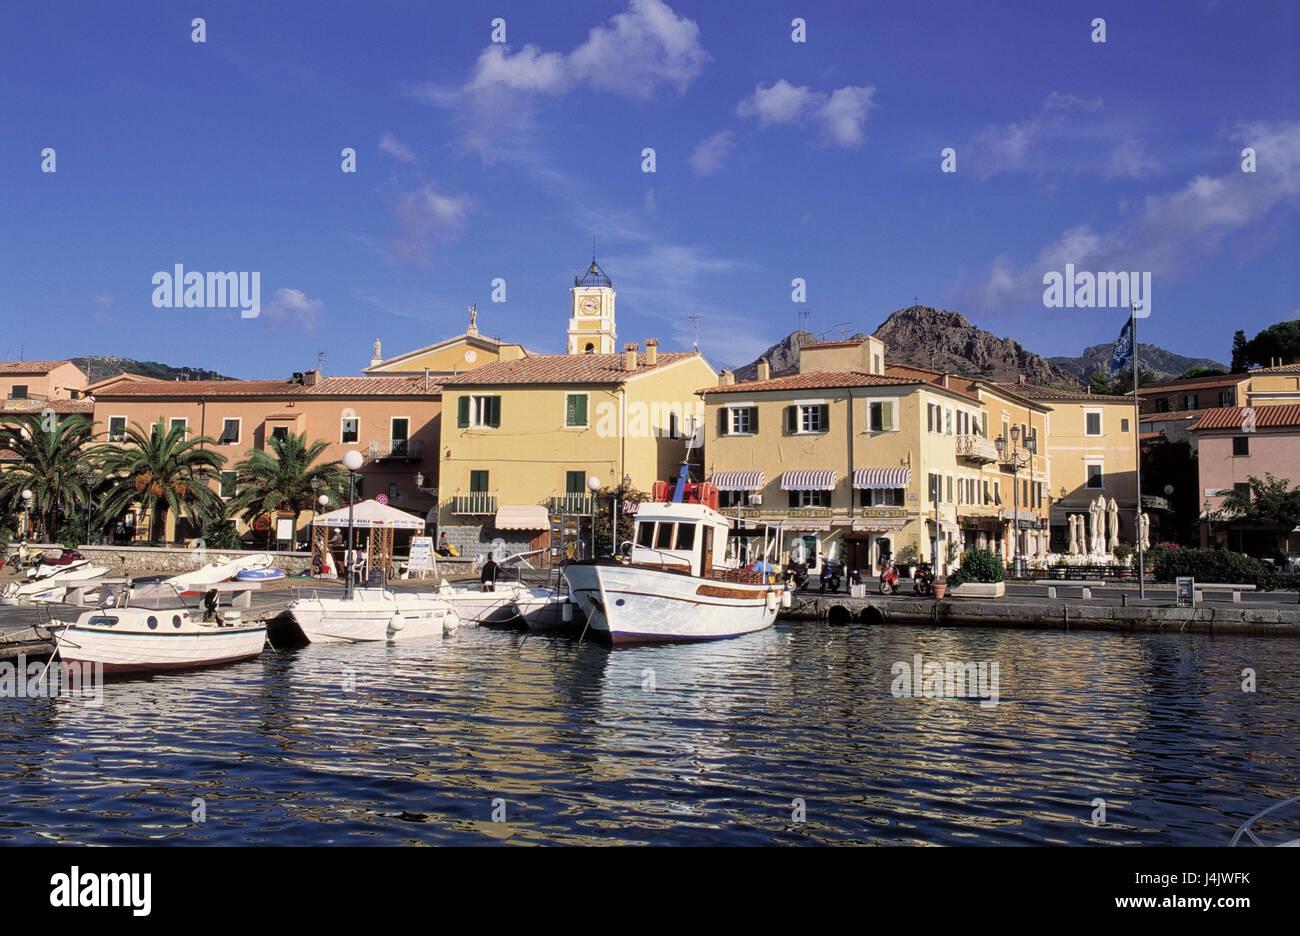 Isola D Elba Stock Photos & Isola D Elba Stock Images